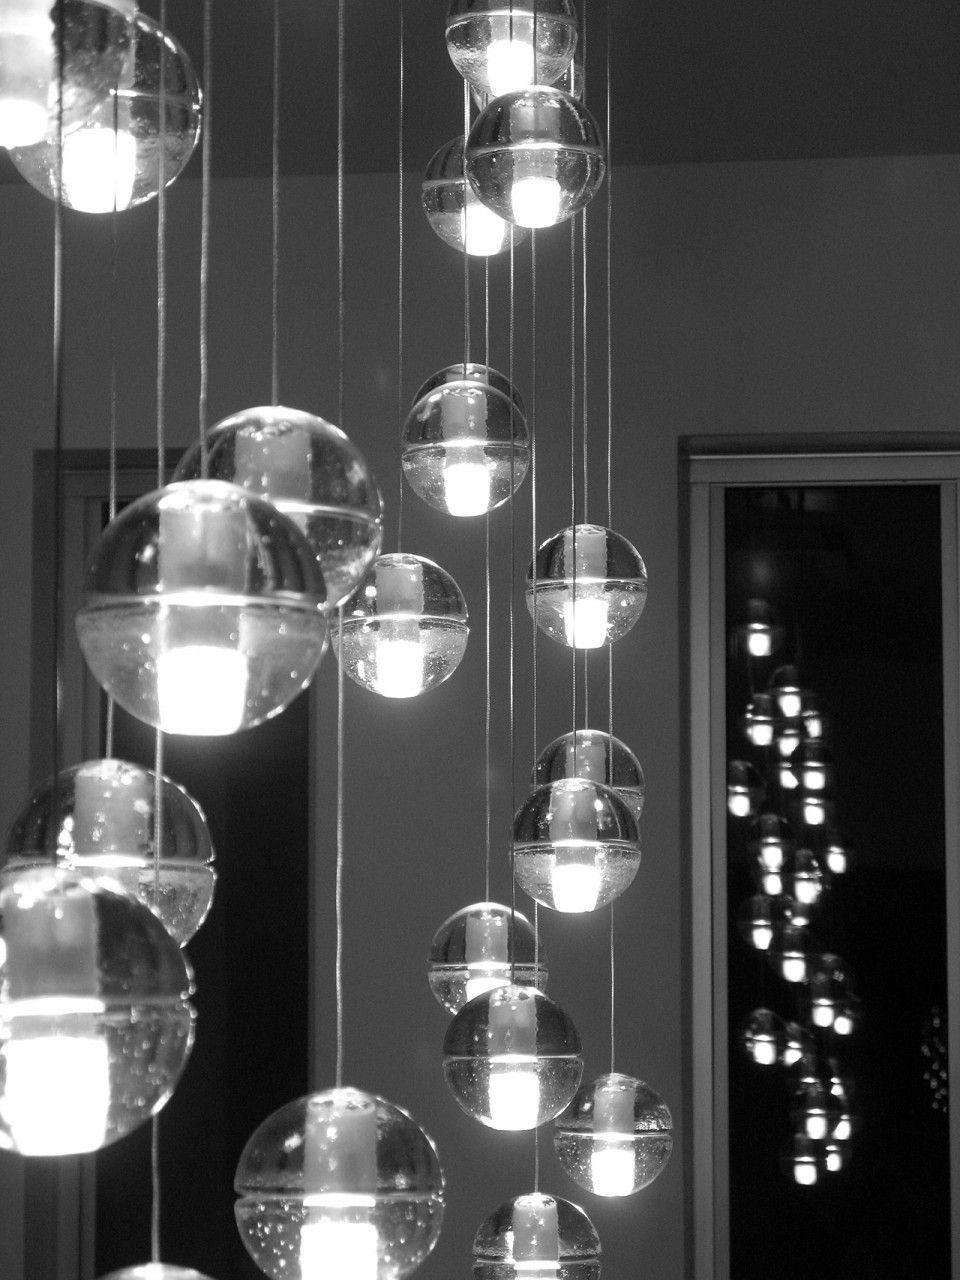 bocci pluie de luminaires intemporels venu du canada. Black Bedroom Furniture Sets. Home Design Ideas